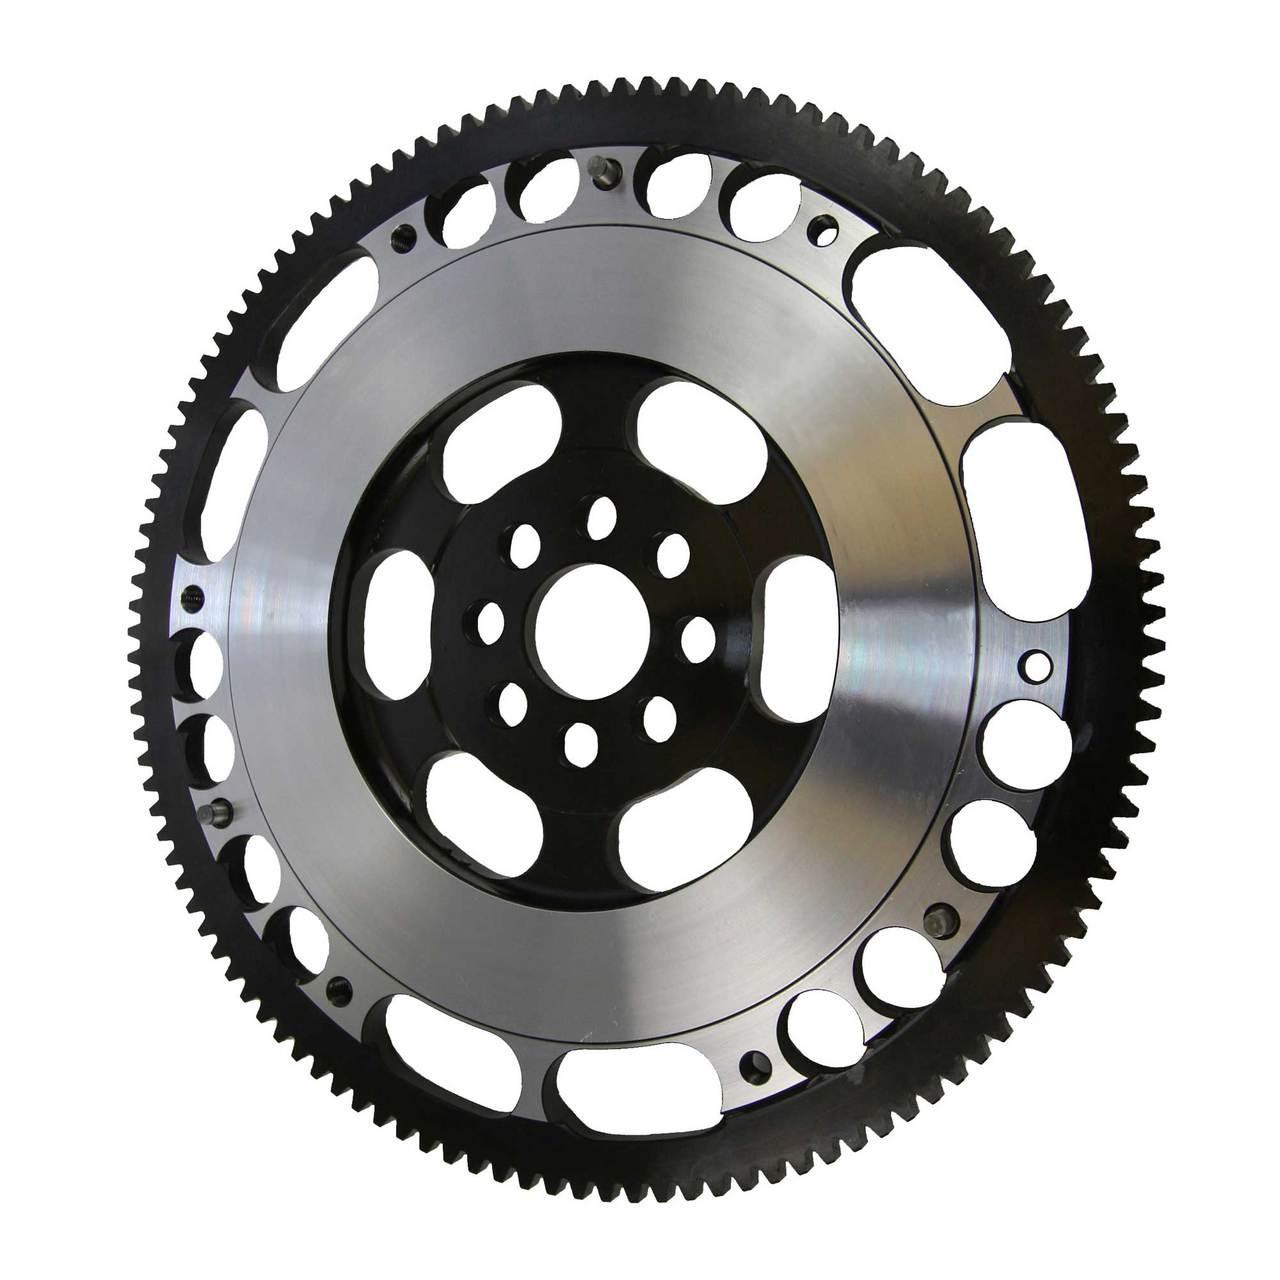 Competition Clutch Ultra-Lightweight Flywheel K Series